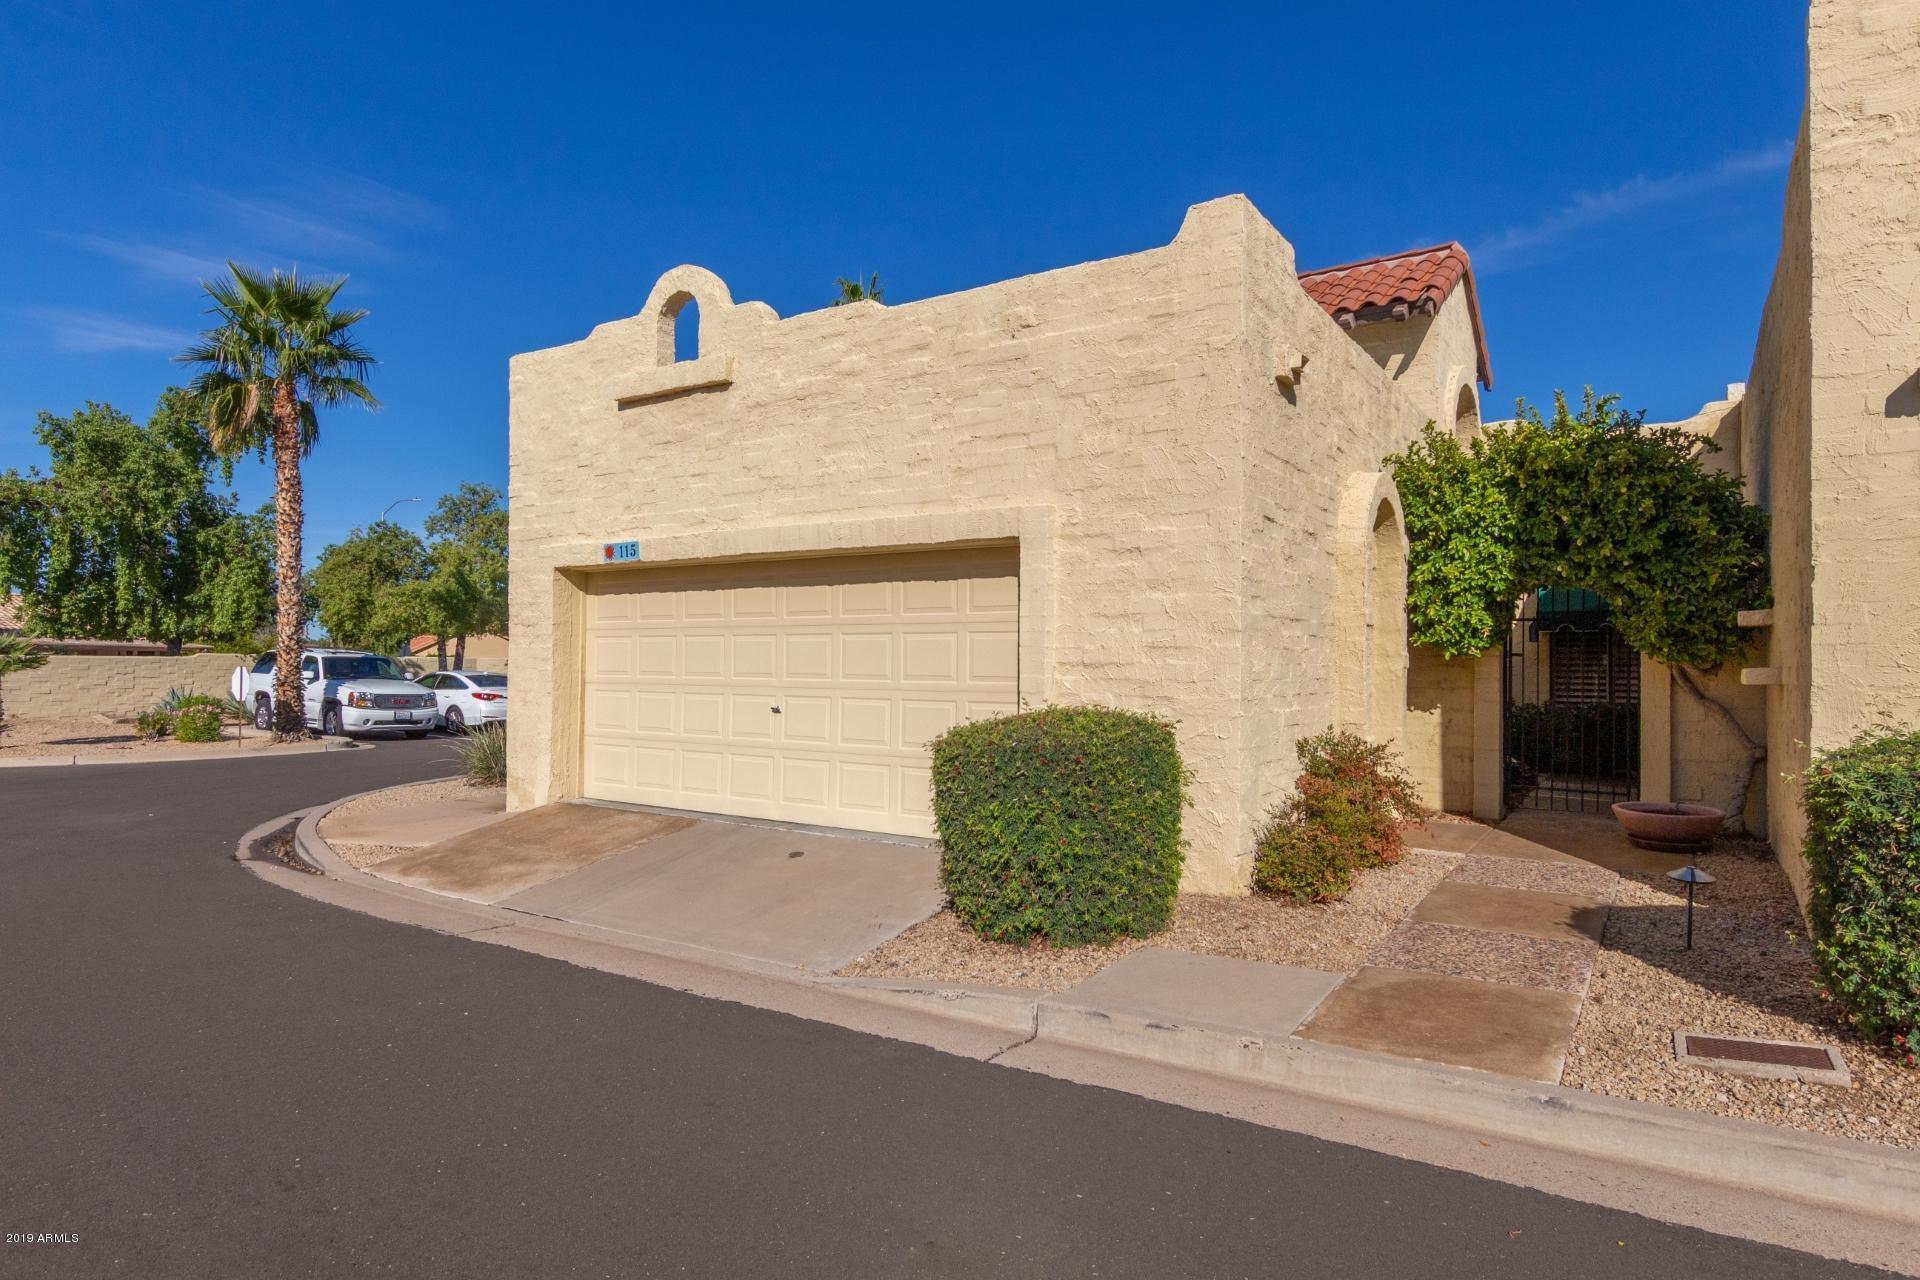 Photo of 1235 N SUNNYVALE -- #115, Mesa, AZ 85205